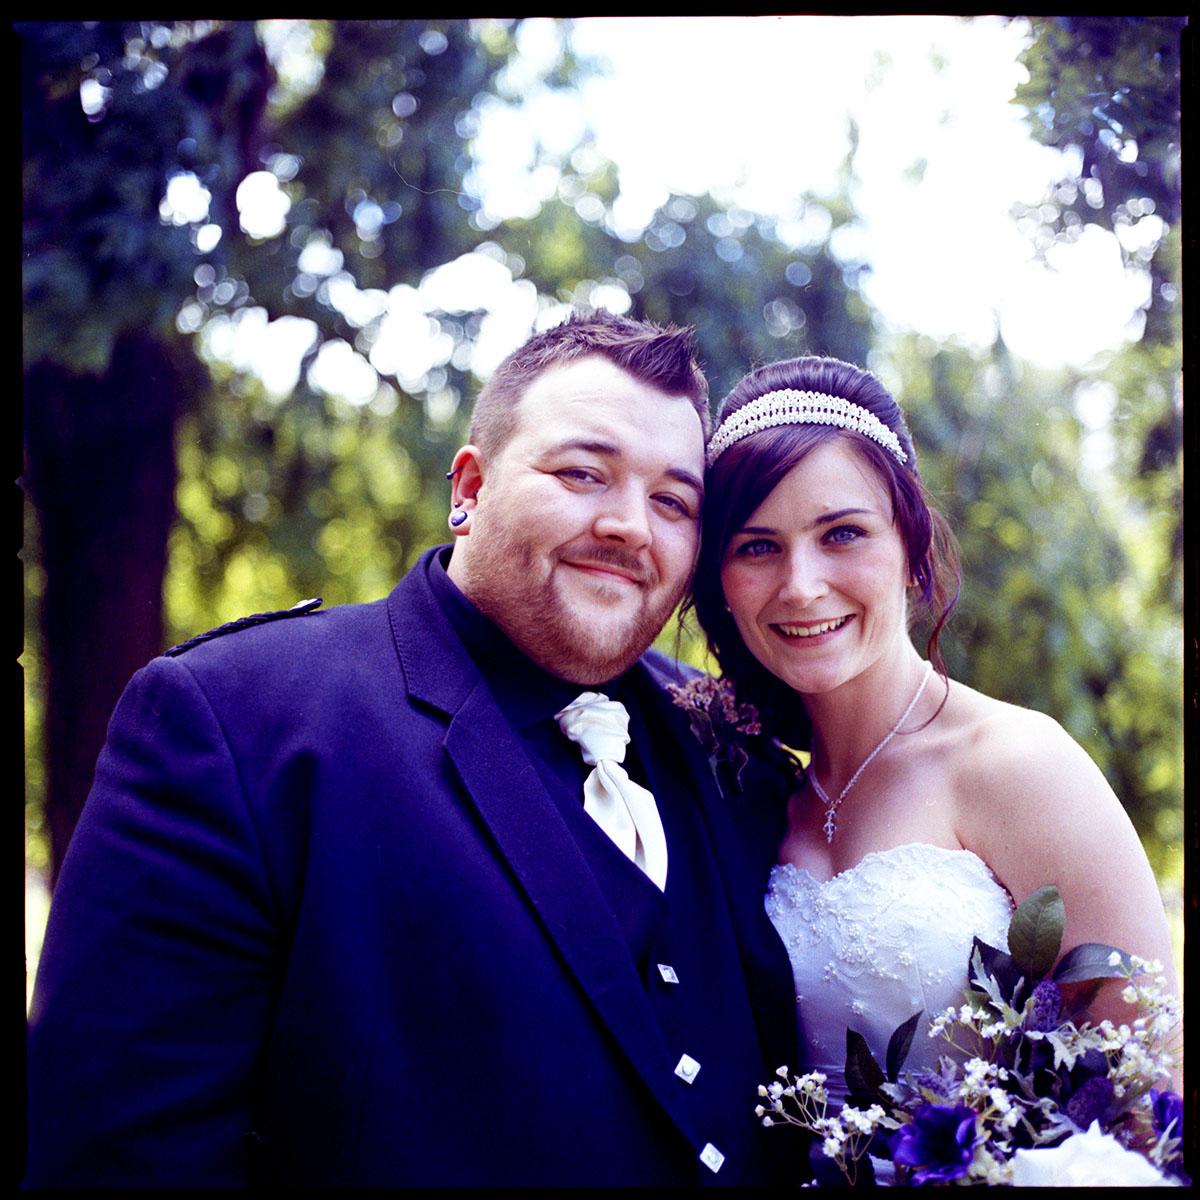 Hasselblad wedding